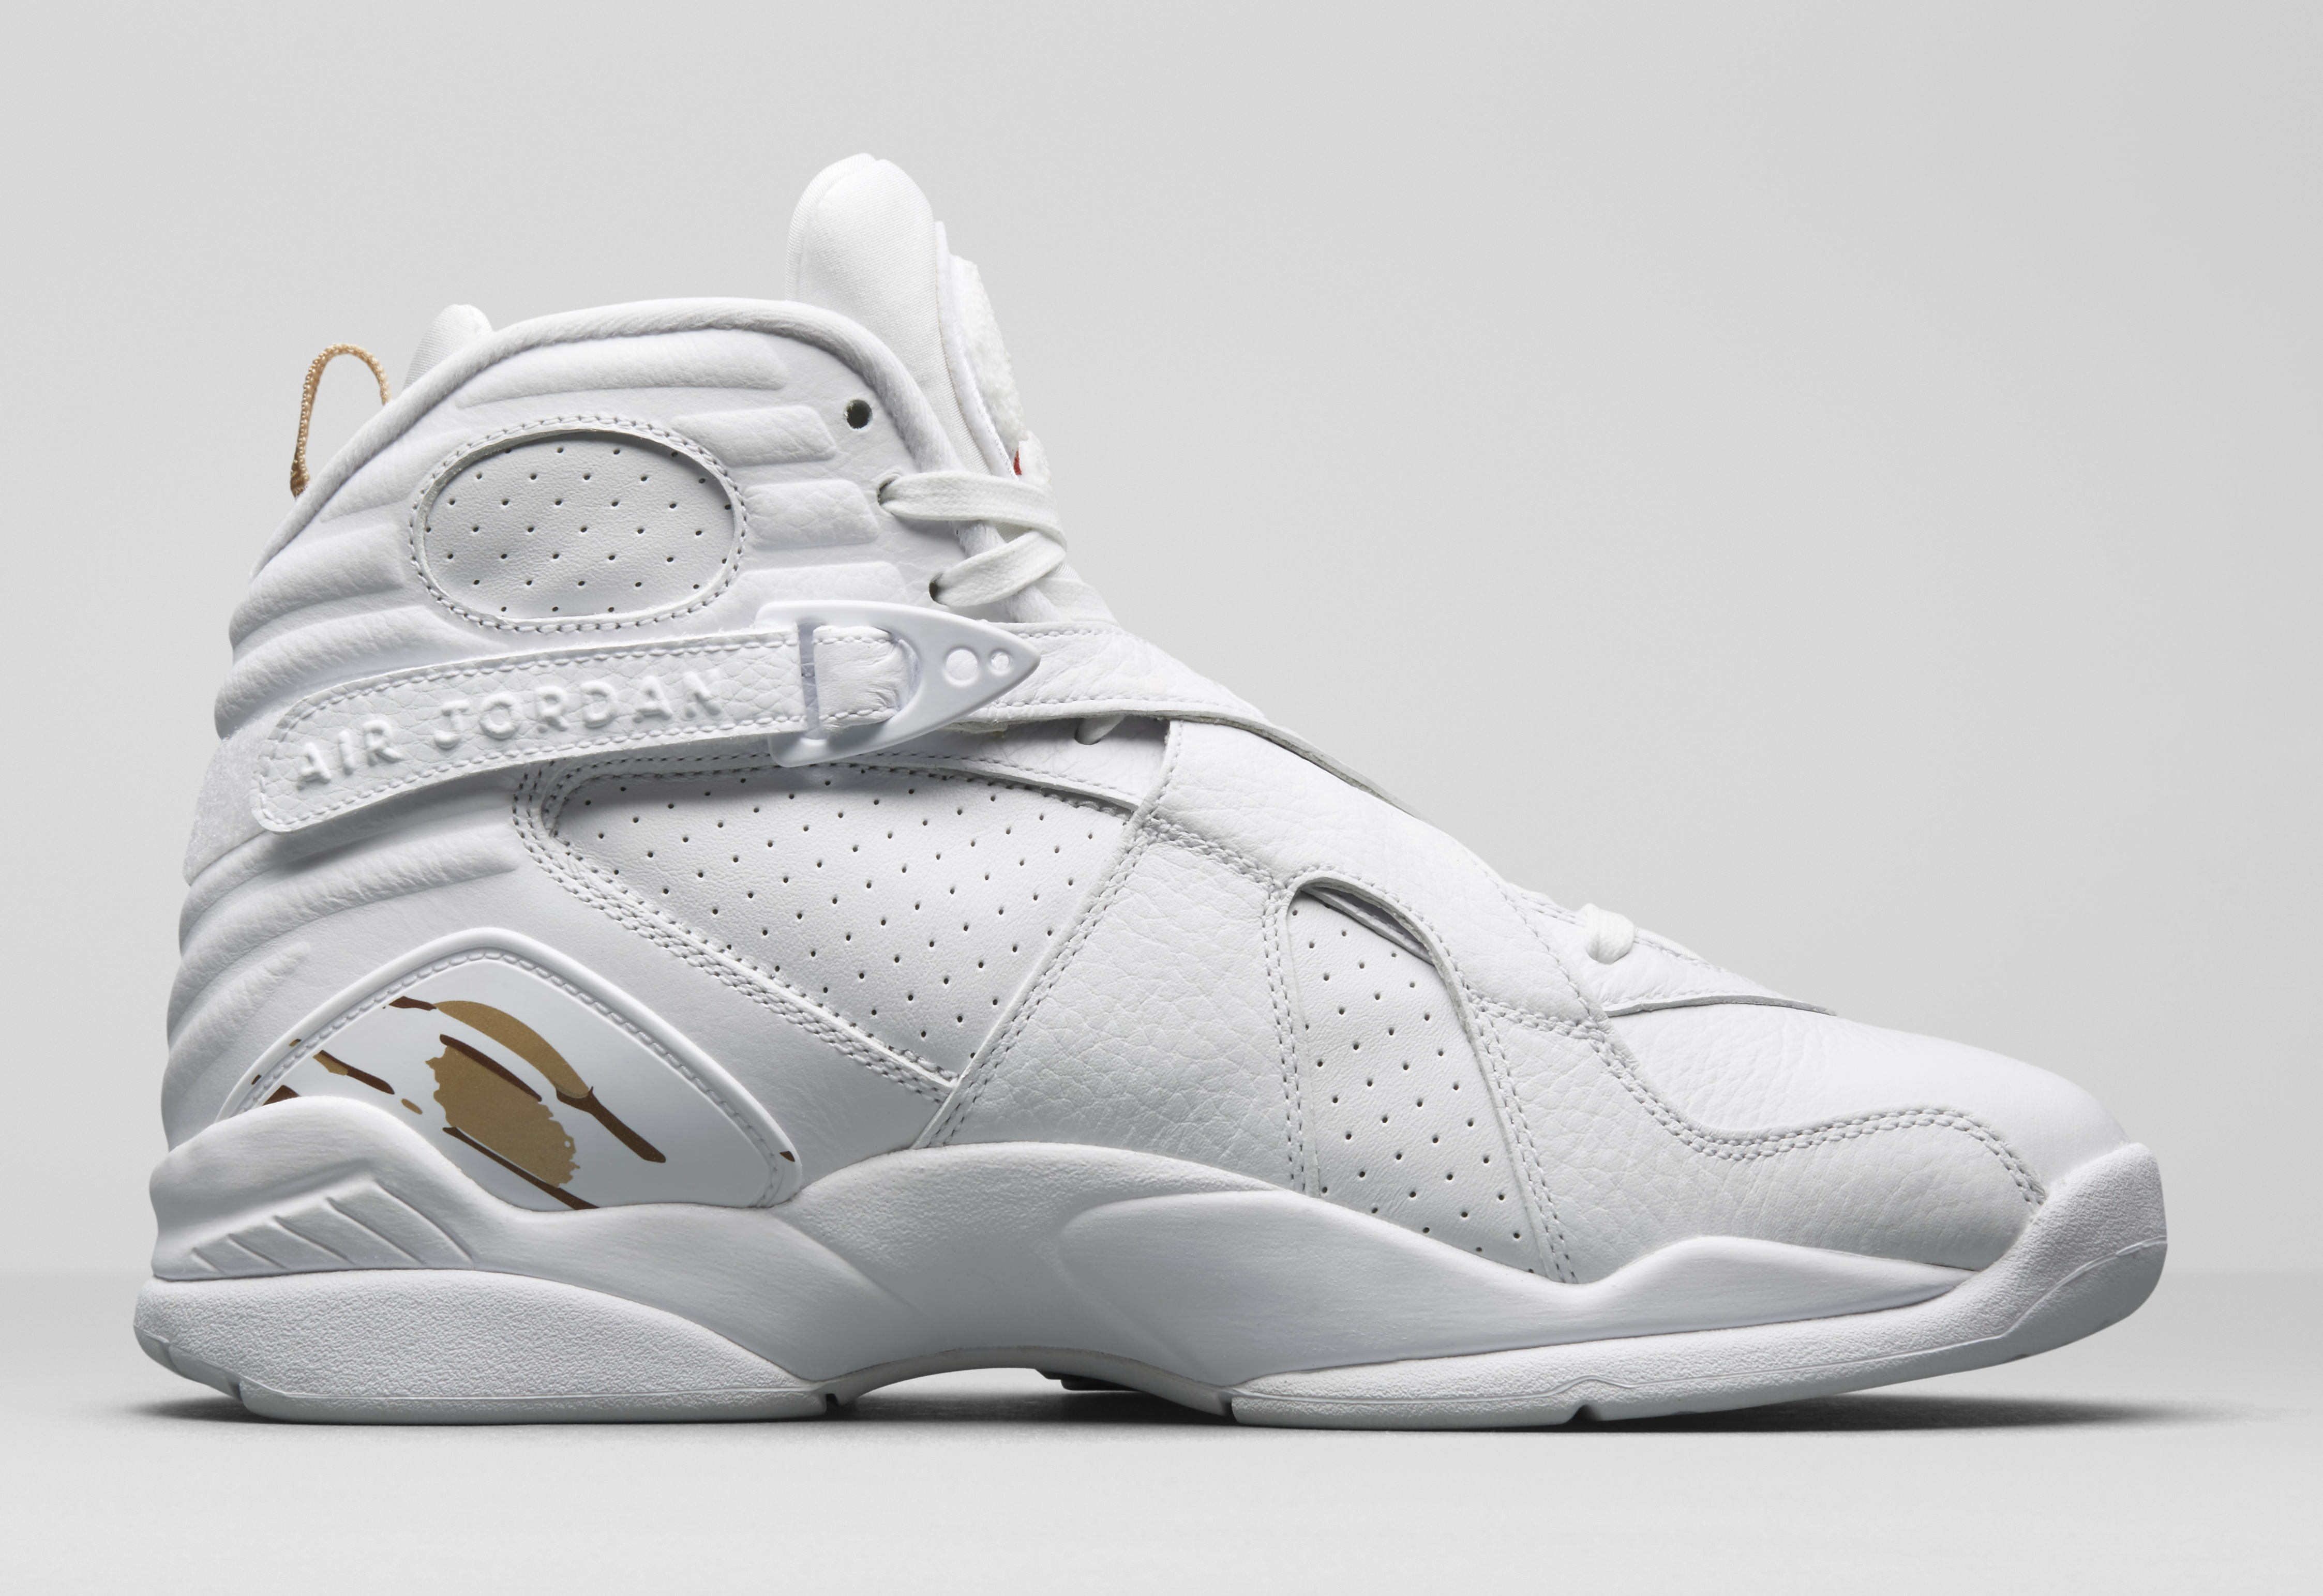 sports shoes e1617 efc53 ... Image via Nike Air Jordan 8 OVO WhiteMetallic Gold-Varsity Red-Blur  AA1239 .